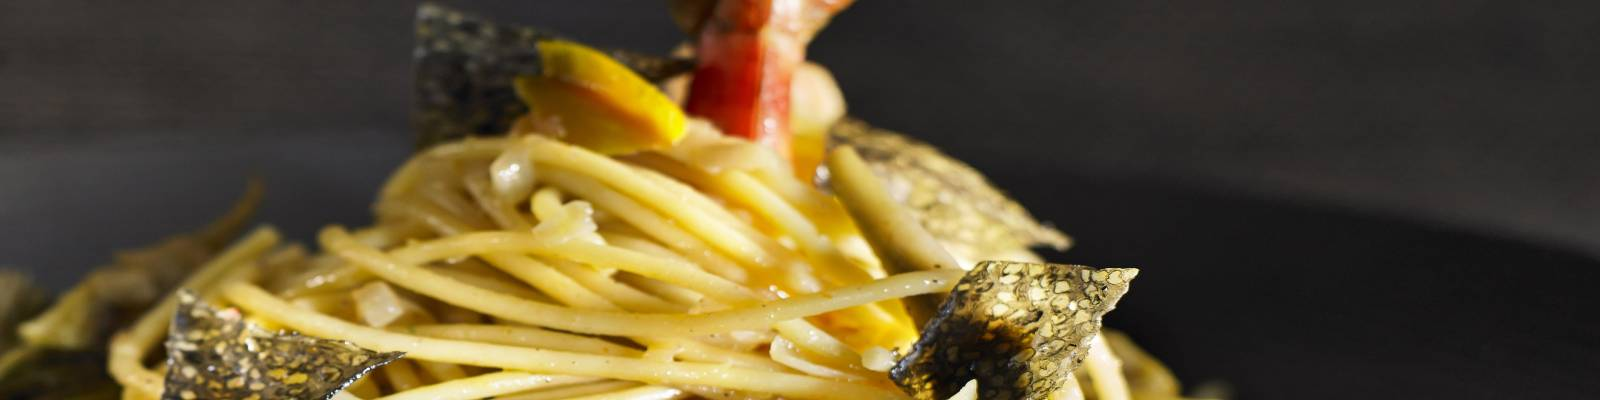 Pasta Garofalo - Spaghetti Garofalo, gambas et pétales de caviar